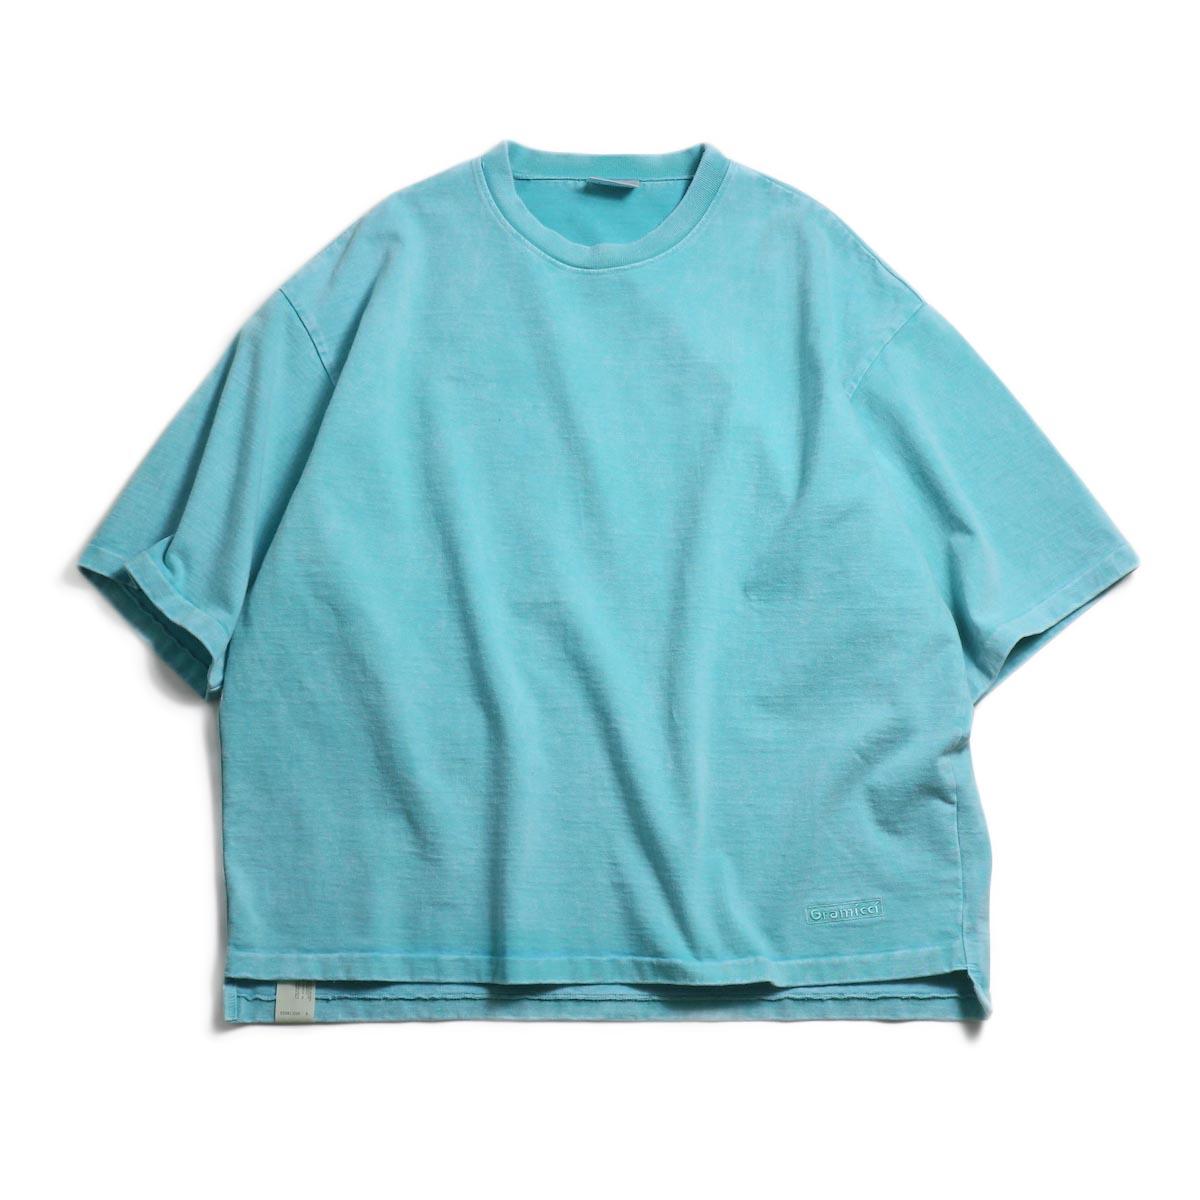 N.HOOLYWOOD × Gramicci  / 191-CS27-024 Short Sleeve Tee -Turquoise 正面